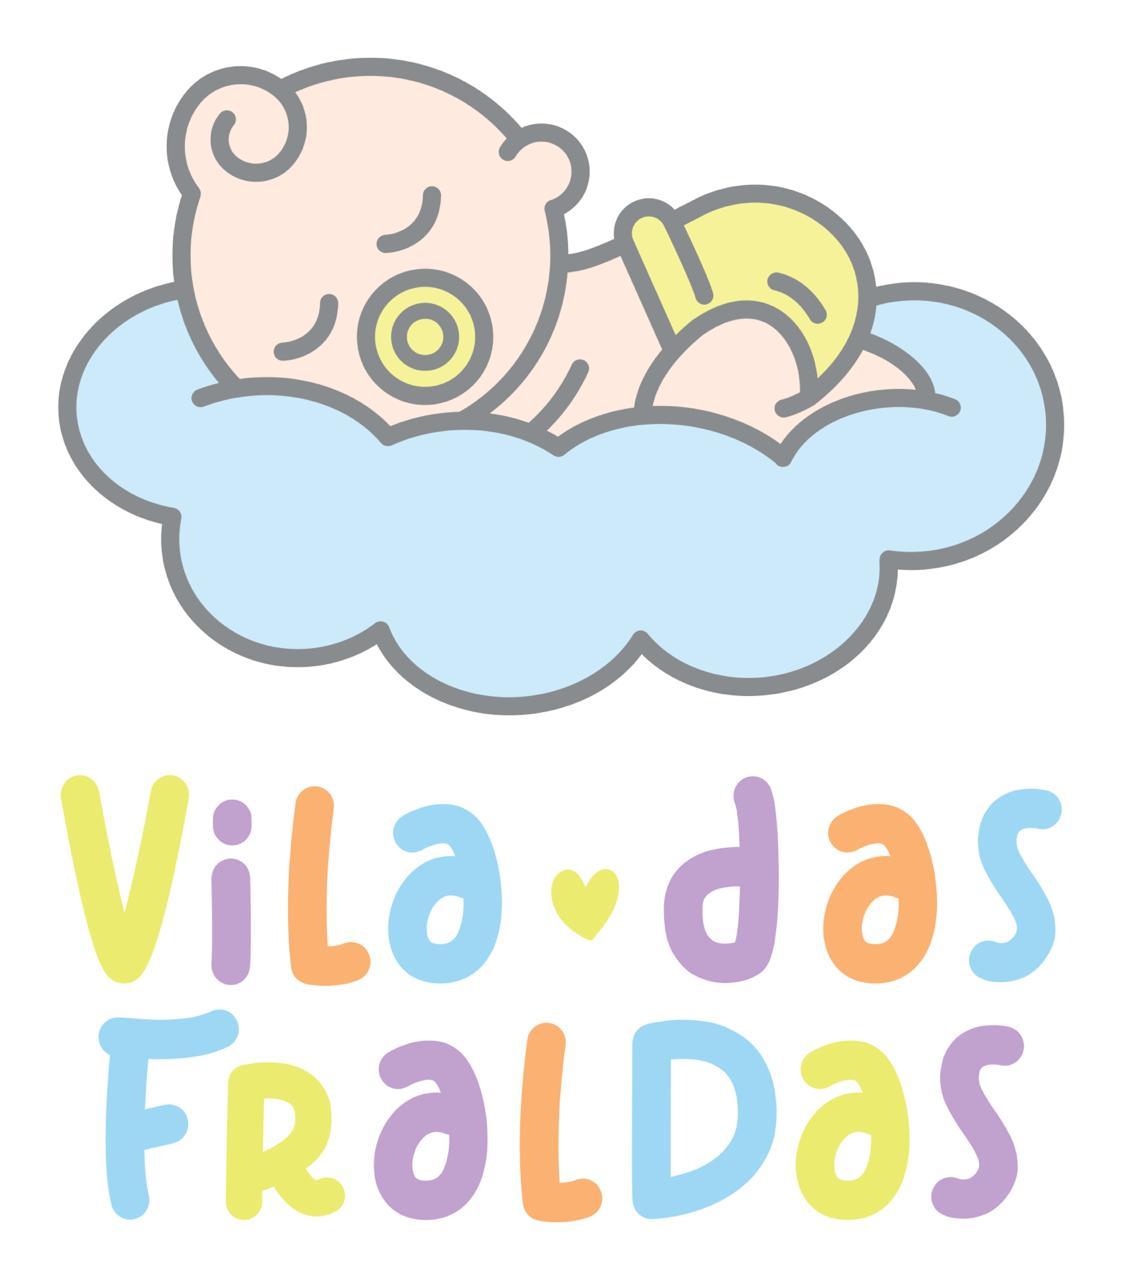 VILA DAS FRALDAS